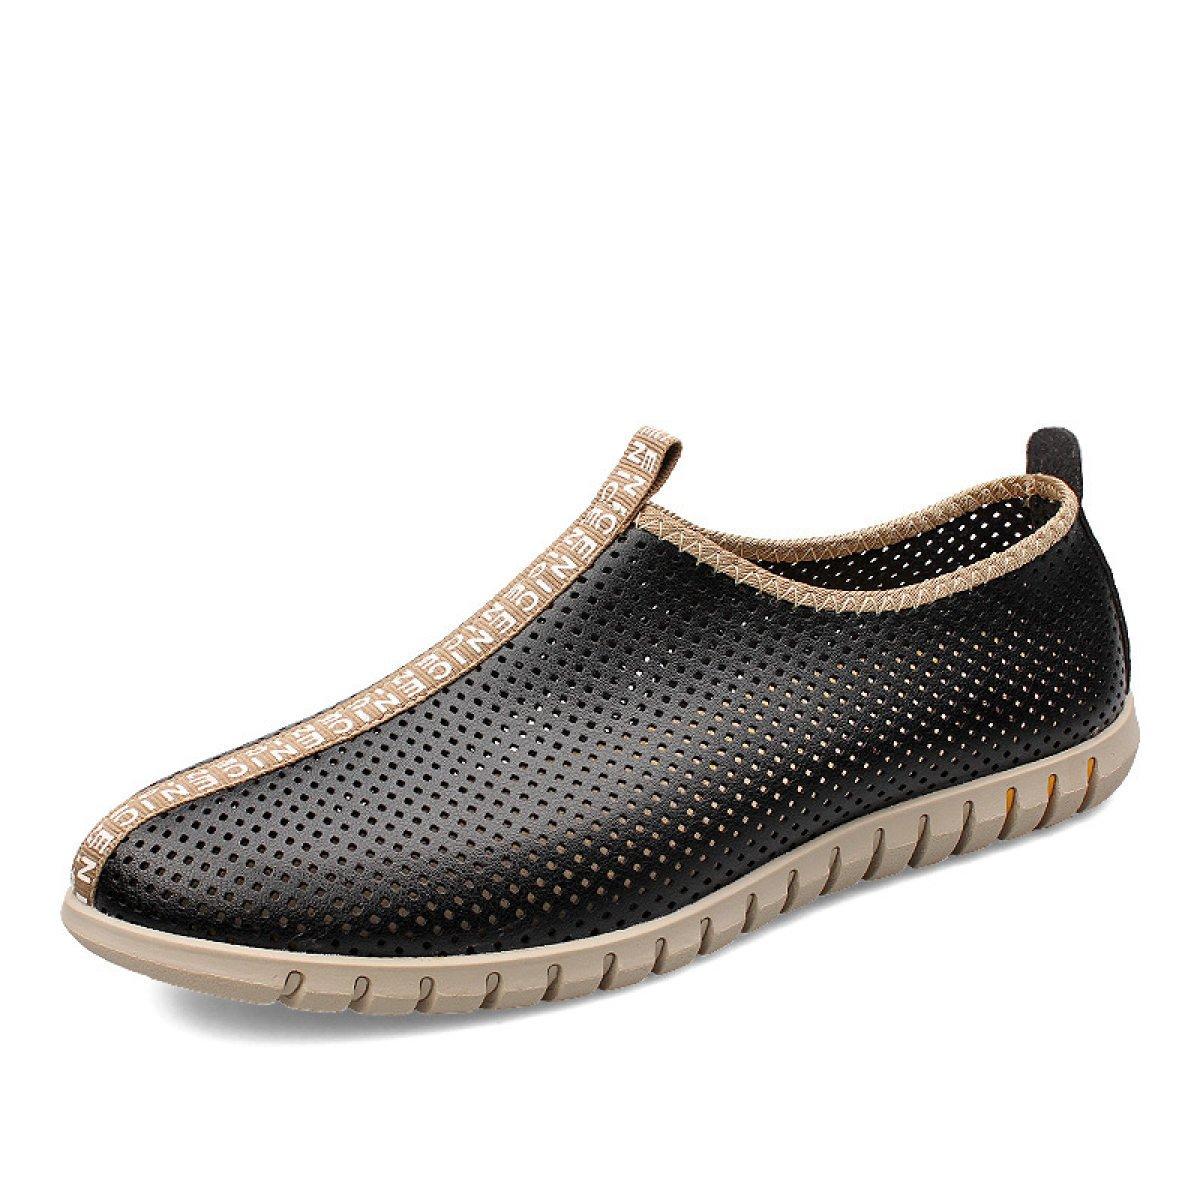 LXXAMens Verano Cuero Casual Zapatos De Trekking Peso Ligero De Malla Transpirable Calzado Deportivo,Black-44EU 44EU Black